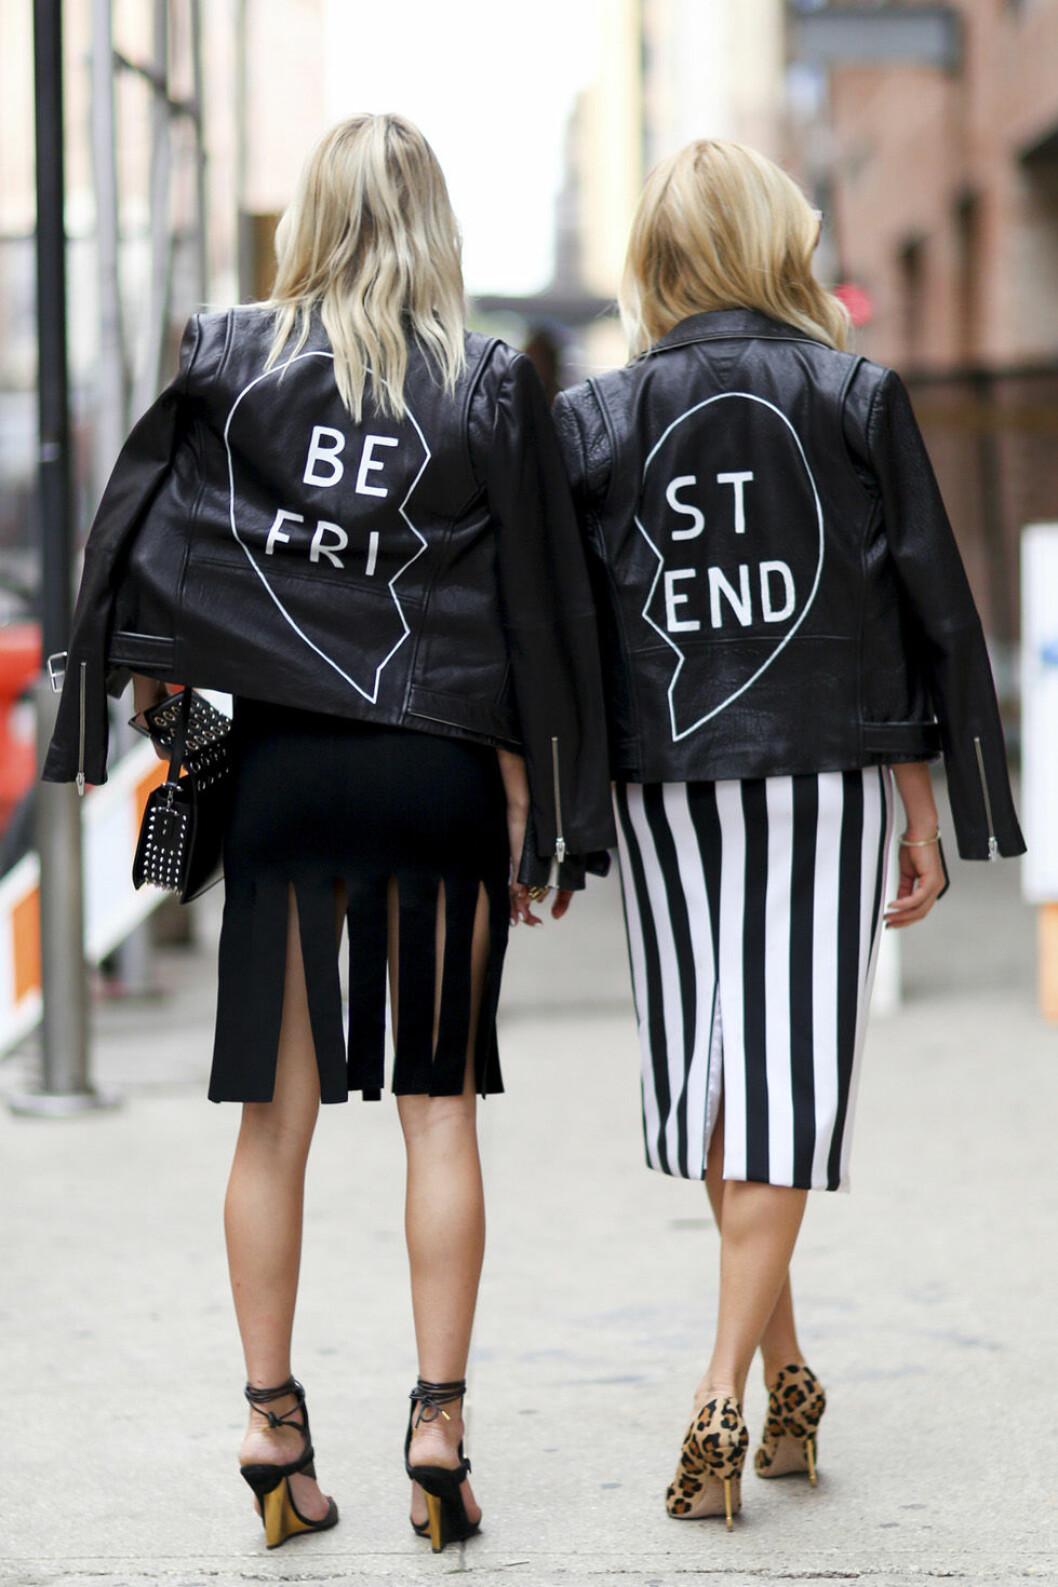 Skinnjackor med texten best friends.